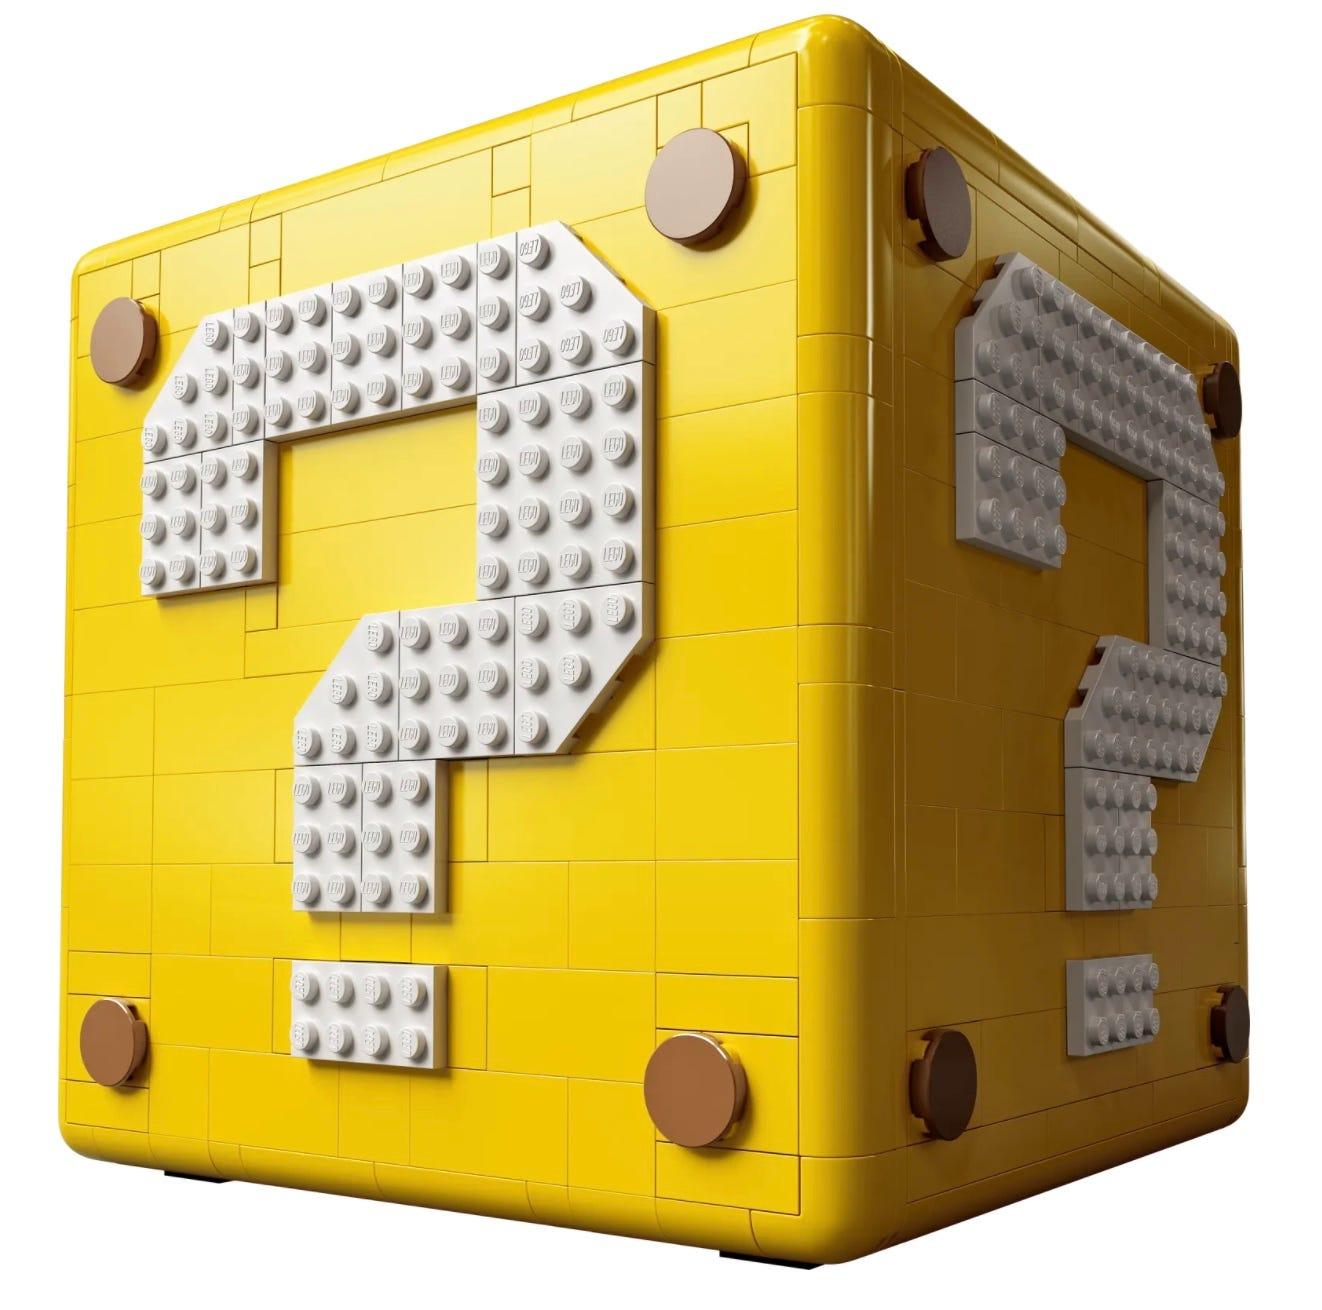 LEGO Super Mario 64 'Question Mark' Block